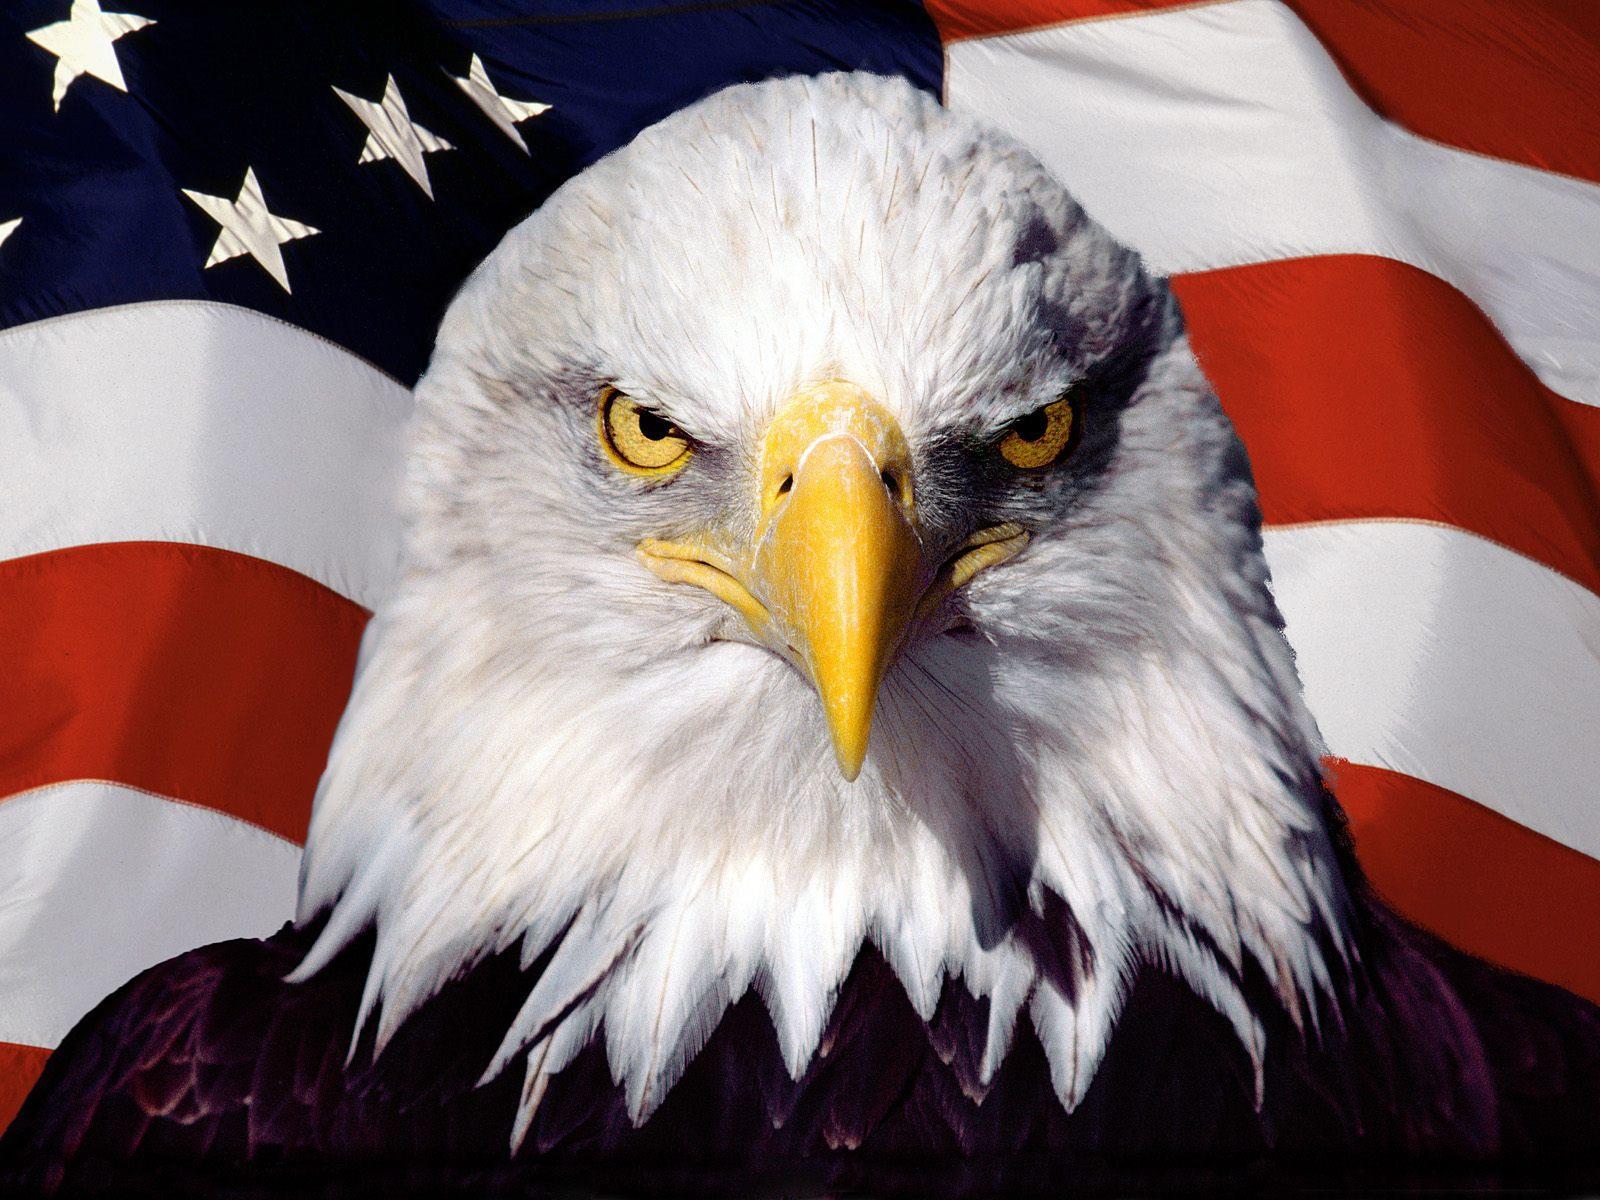 Bald Eagle Wallpapers Download 2NN4C23   4USkY 1600x1200